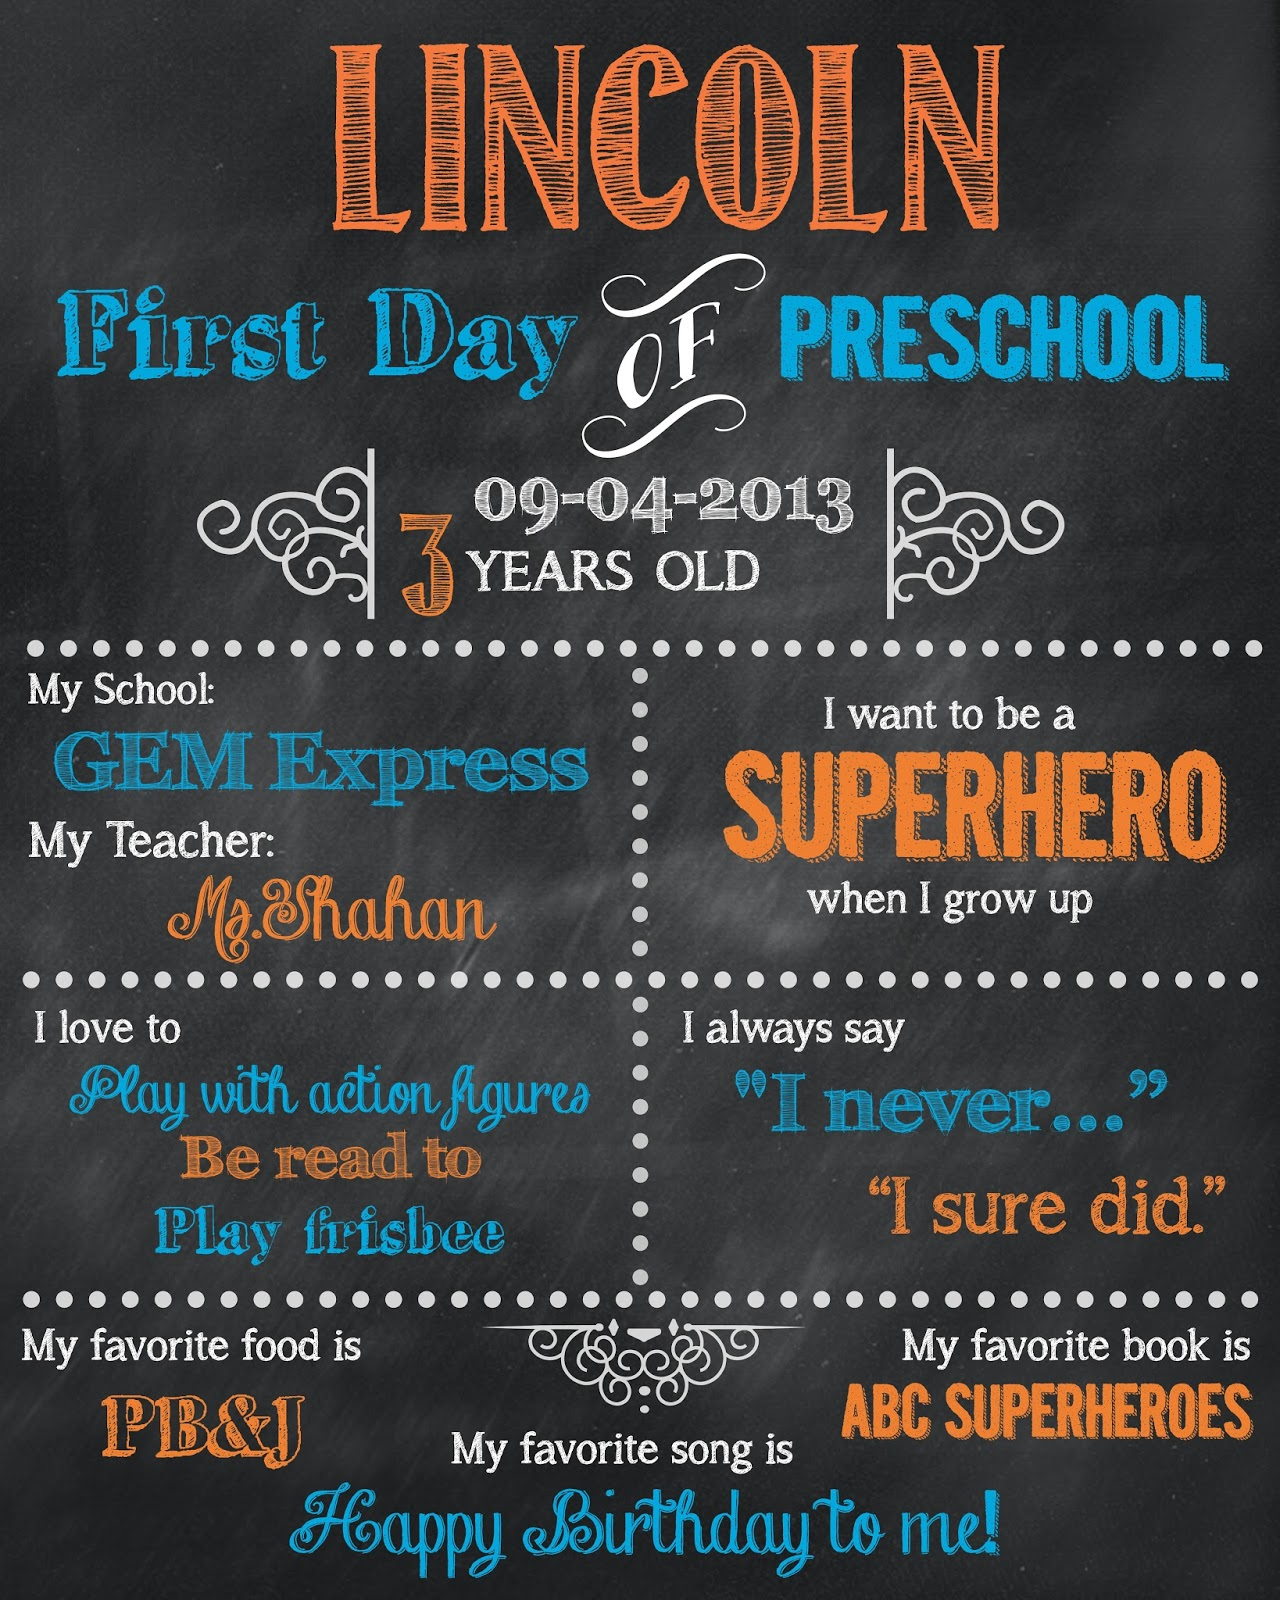 FirstDayofSchool LIncoln - Kindergarten First Day Of School